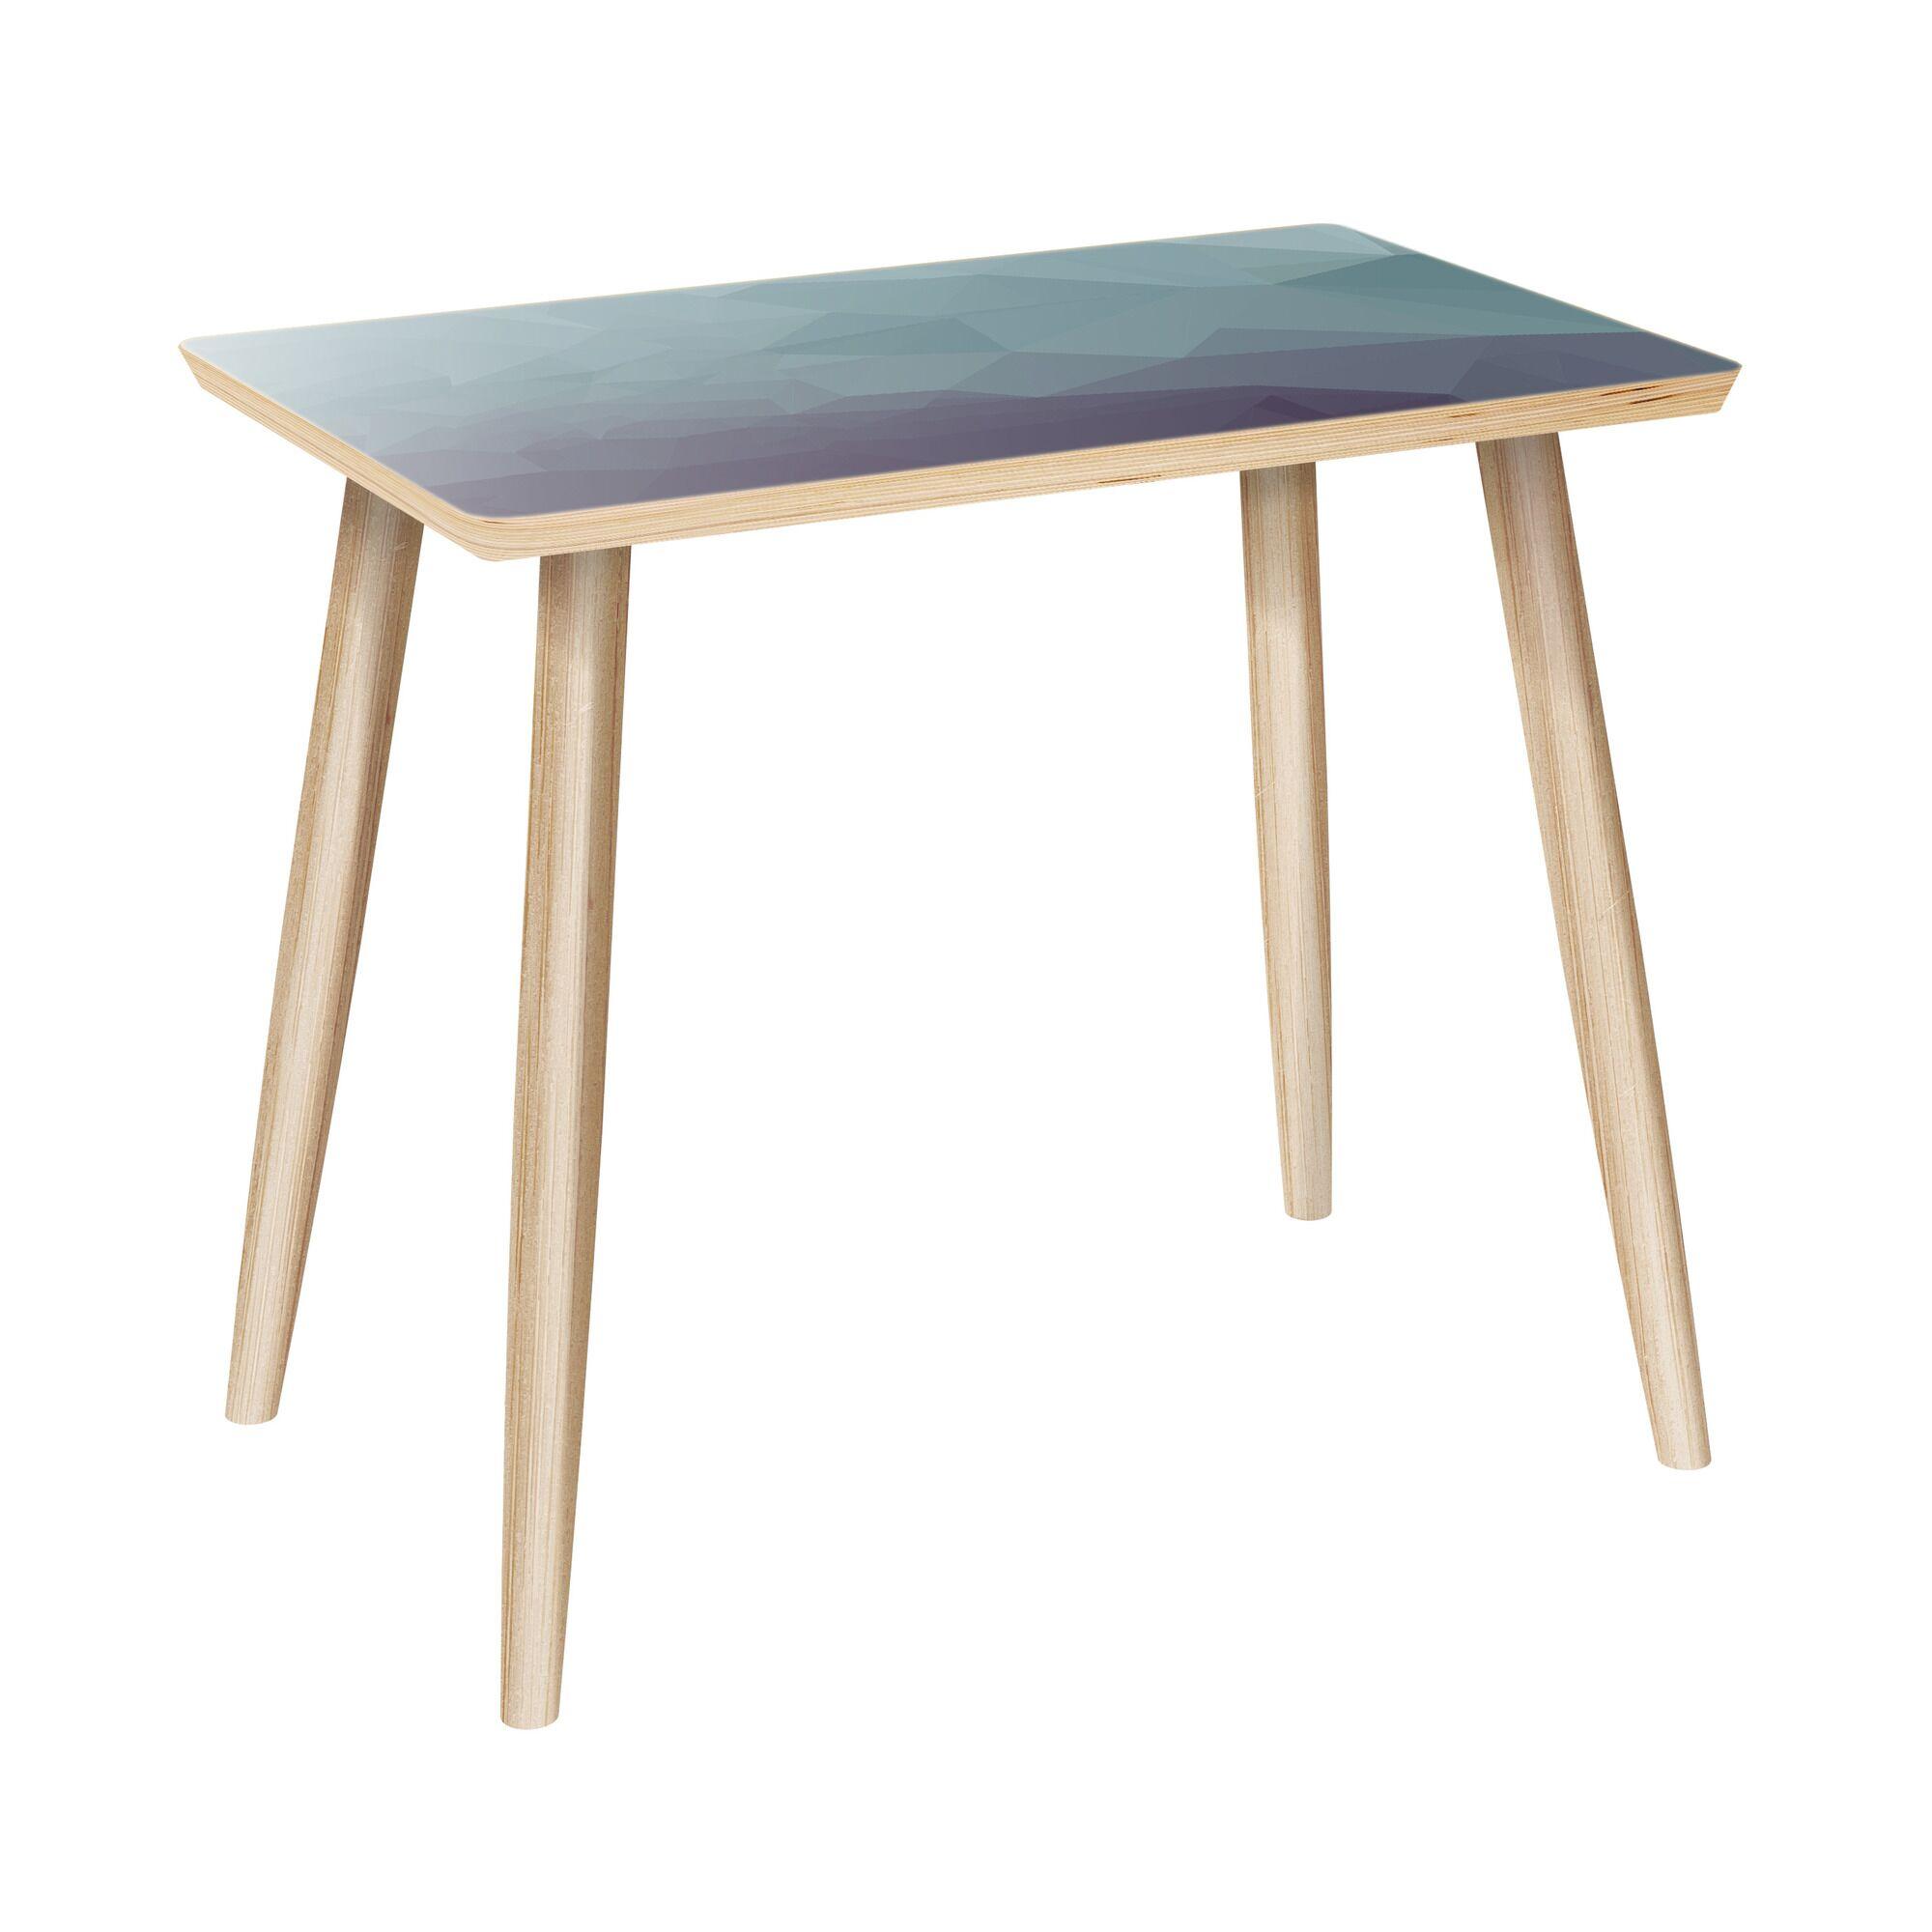 Mariella End Table Table Base Color: Natural, Table Top Color: Gray/Black